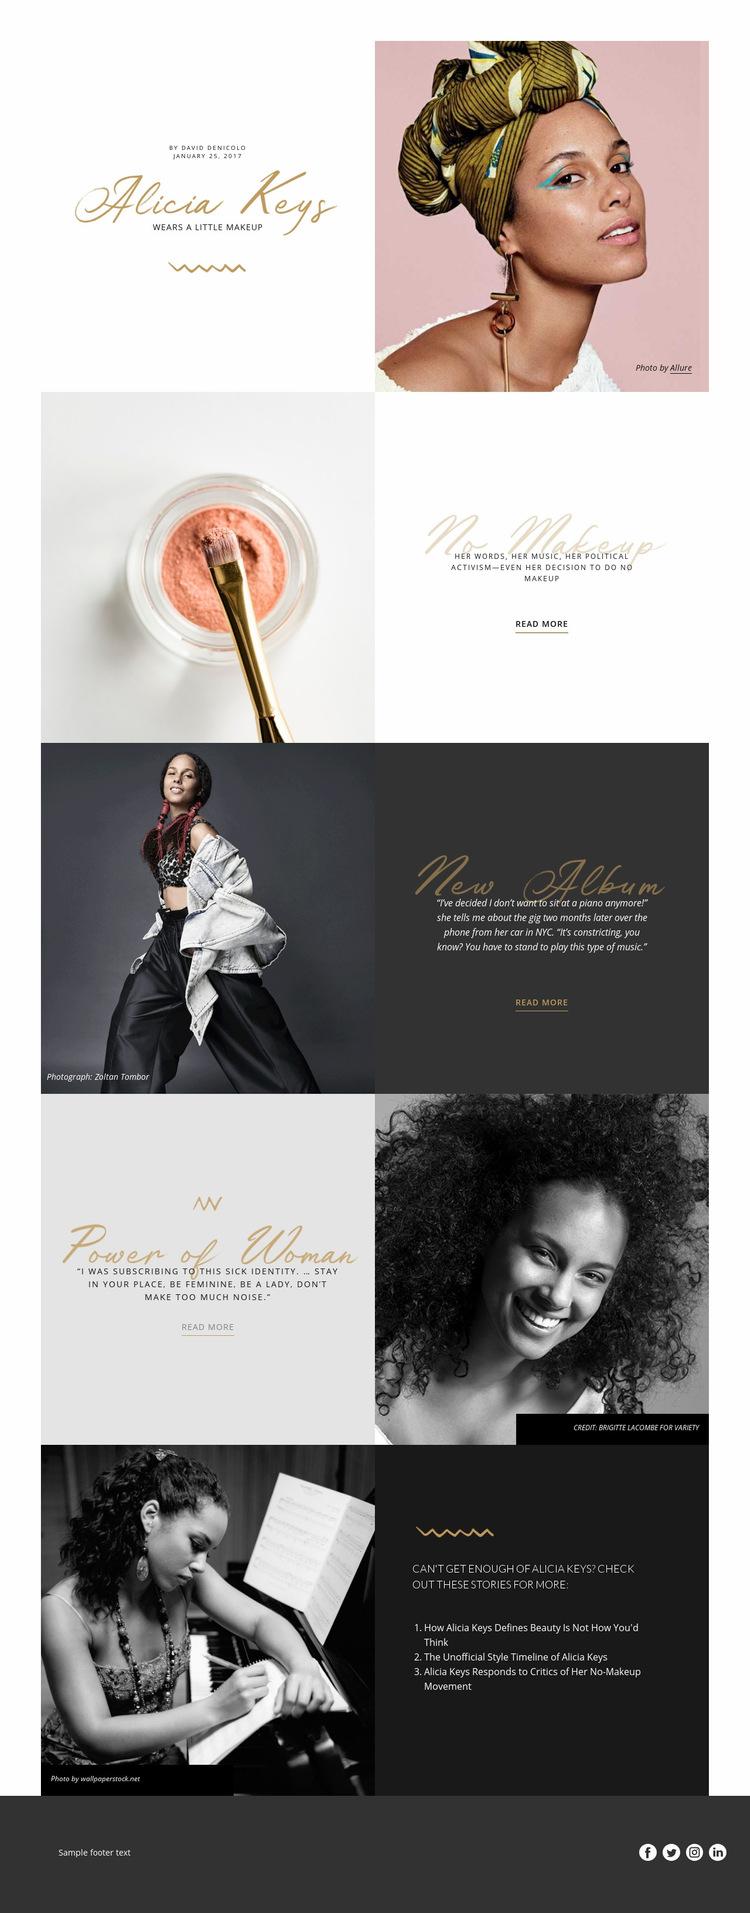 Alicia Keys Web Page Design